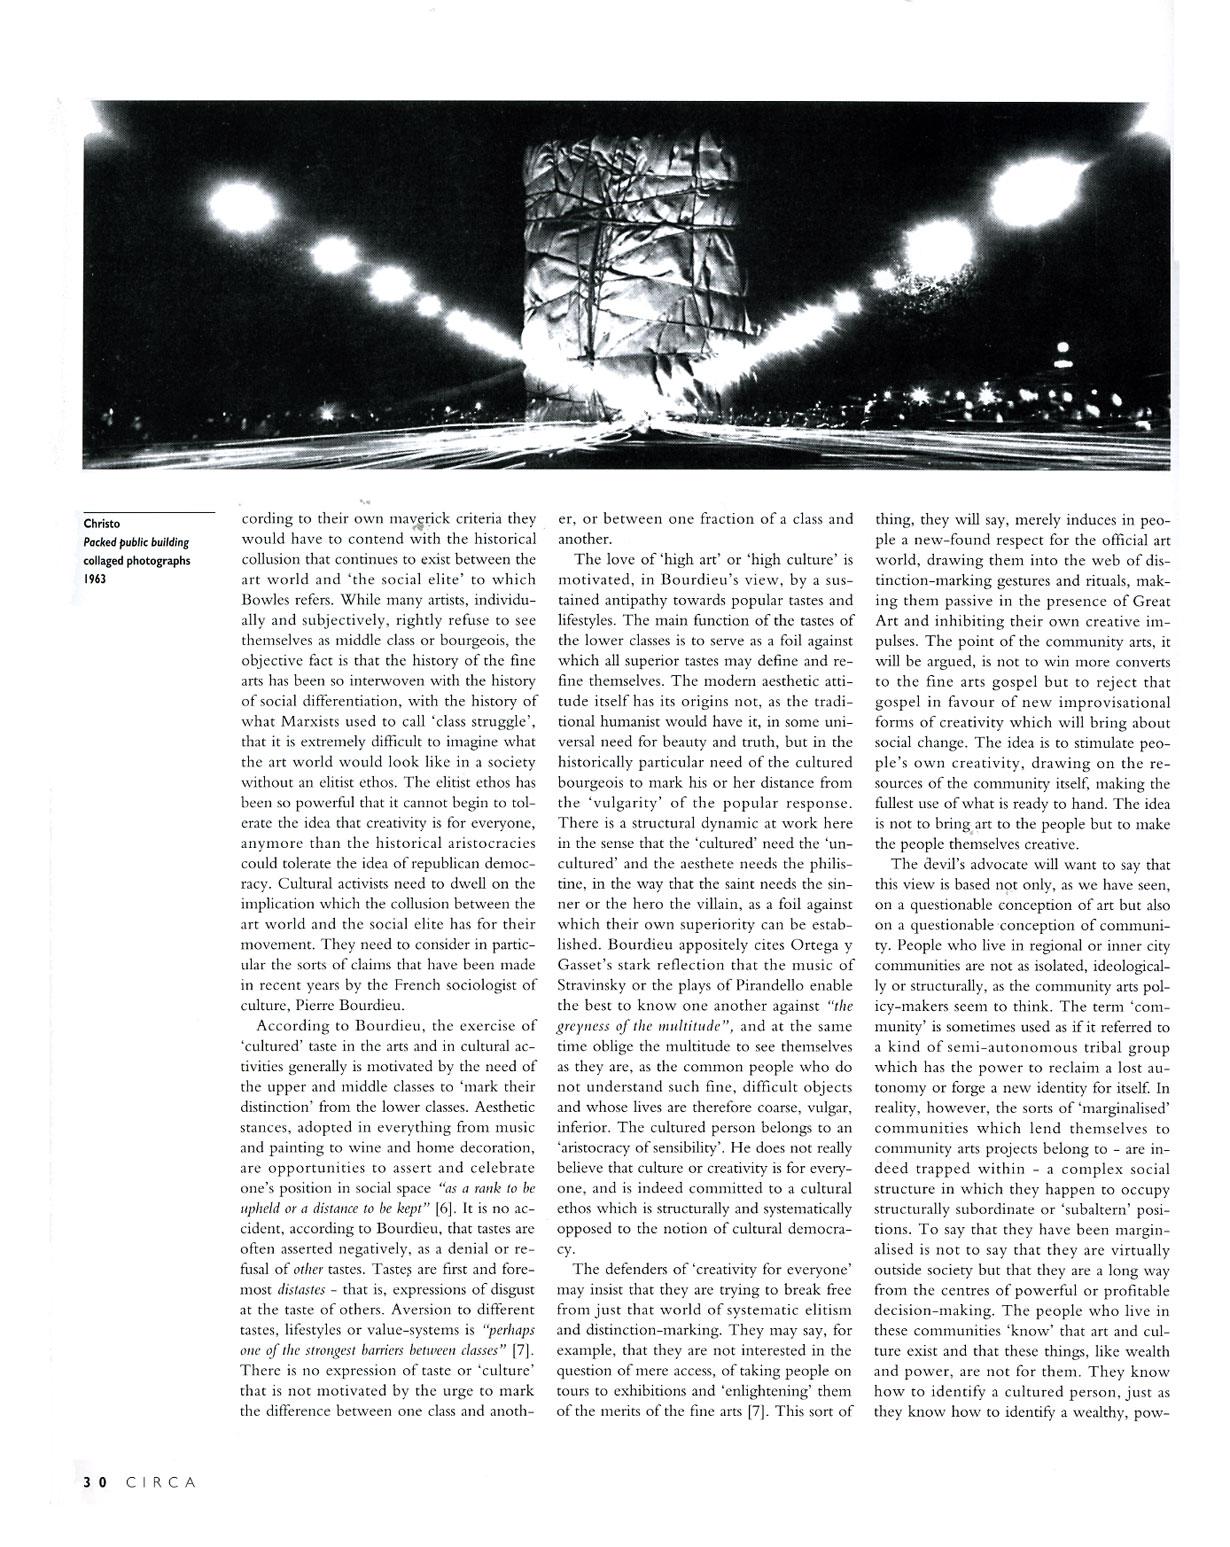 Circa Art Magazine, Issue 67, Spring 1994, p. 30